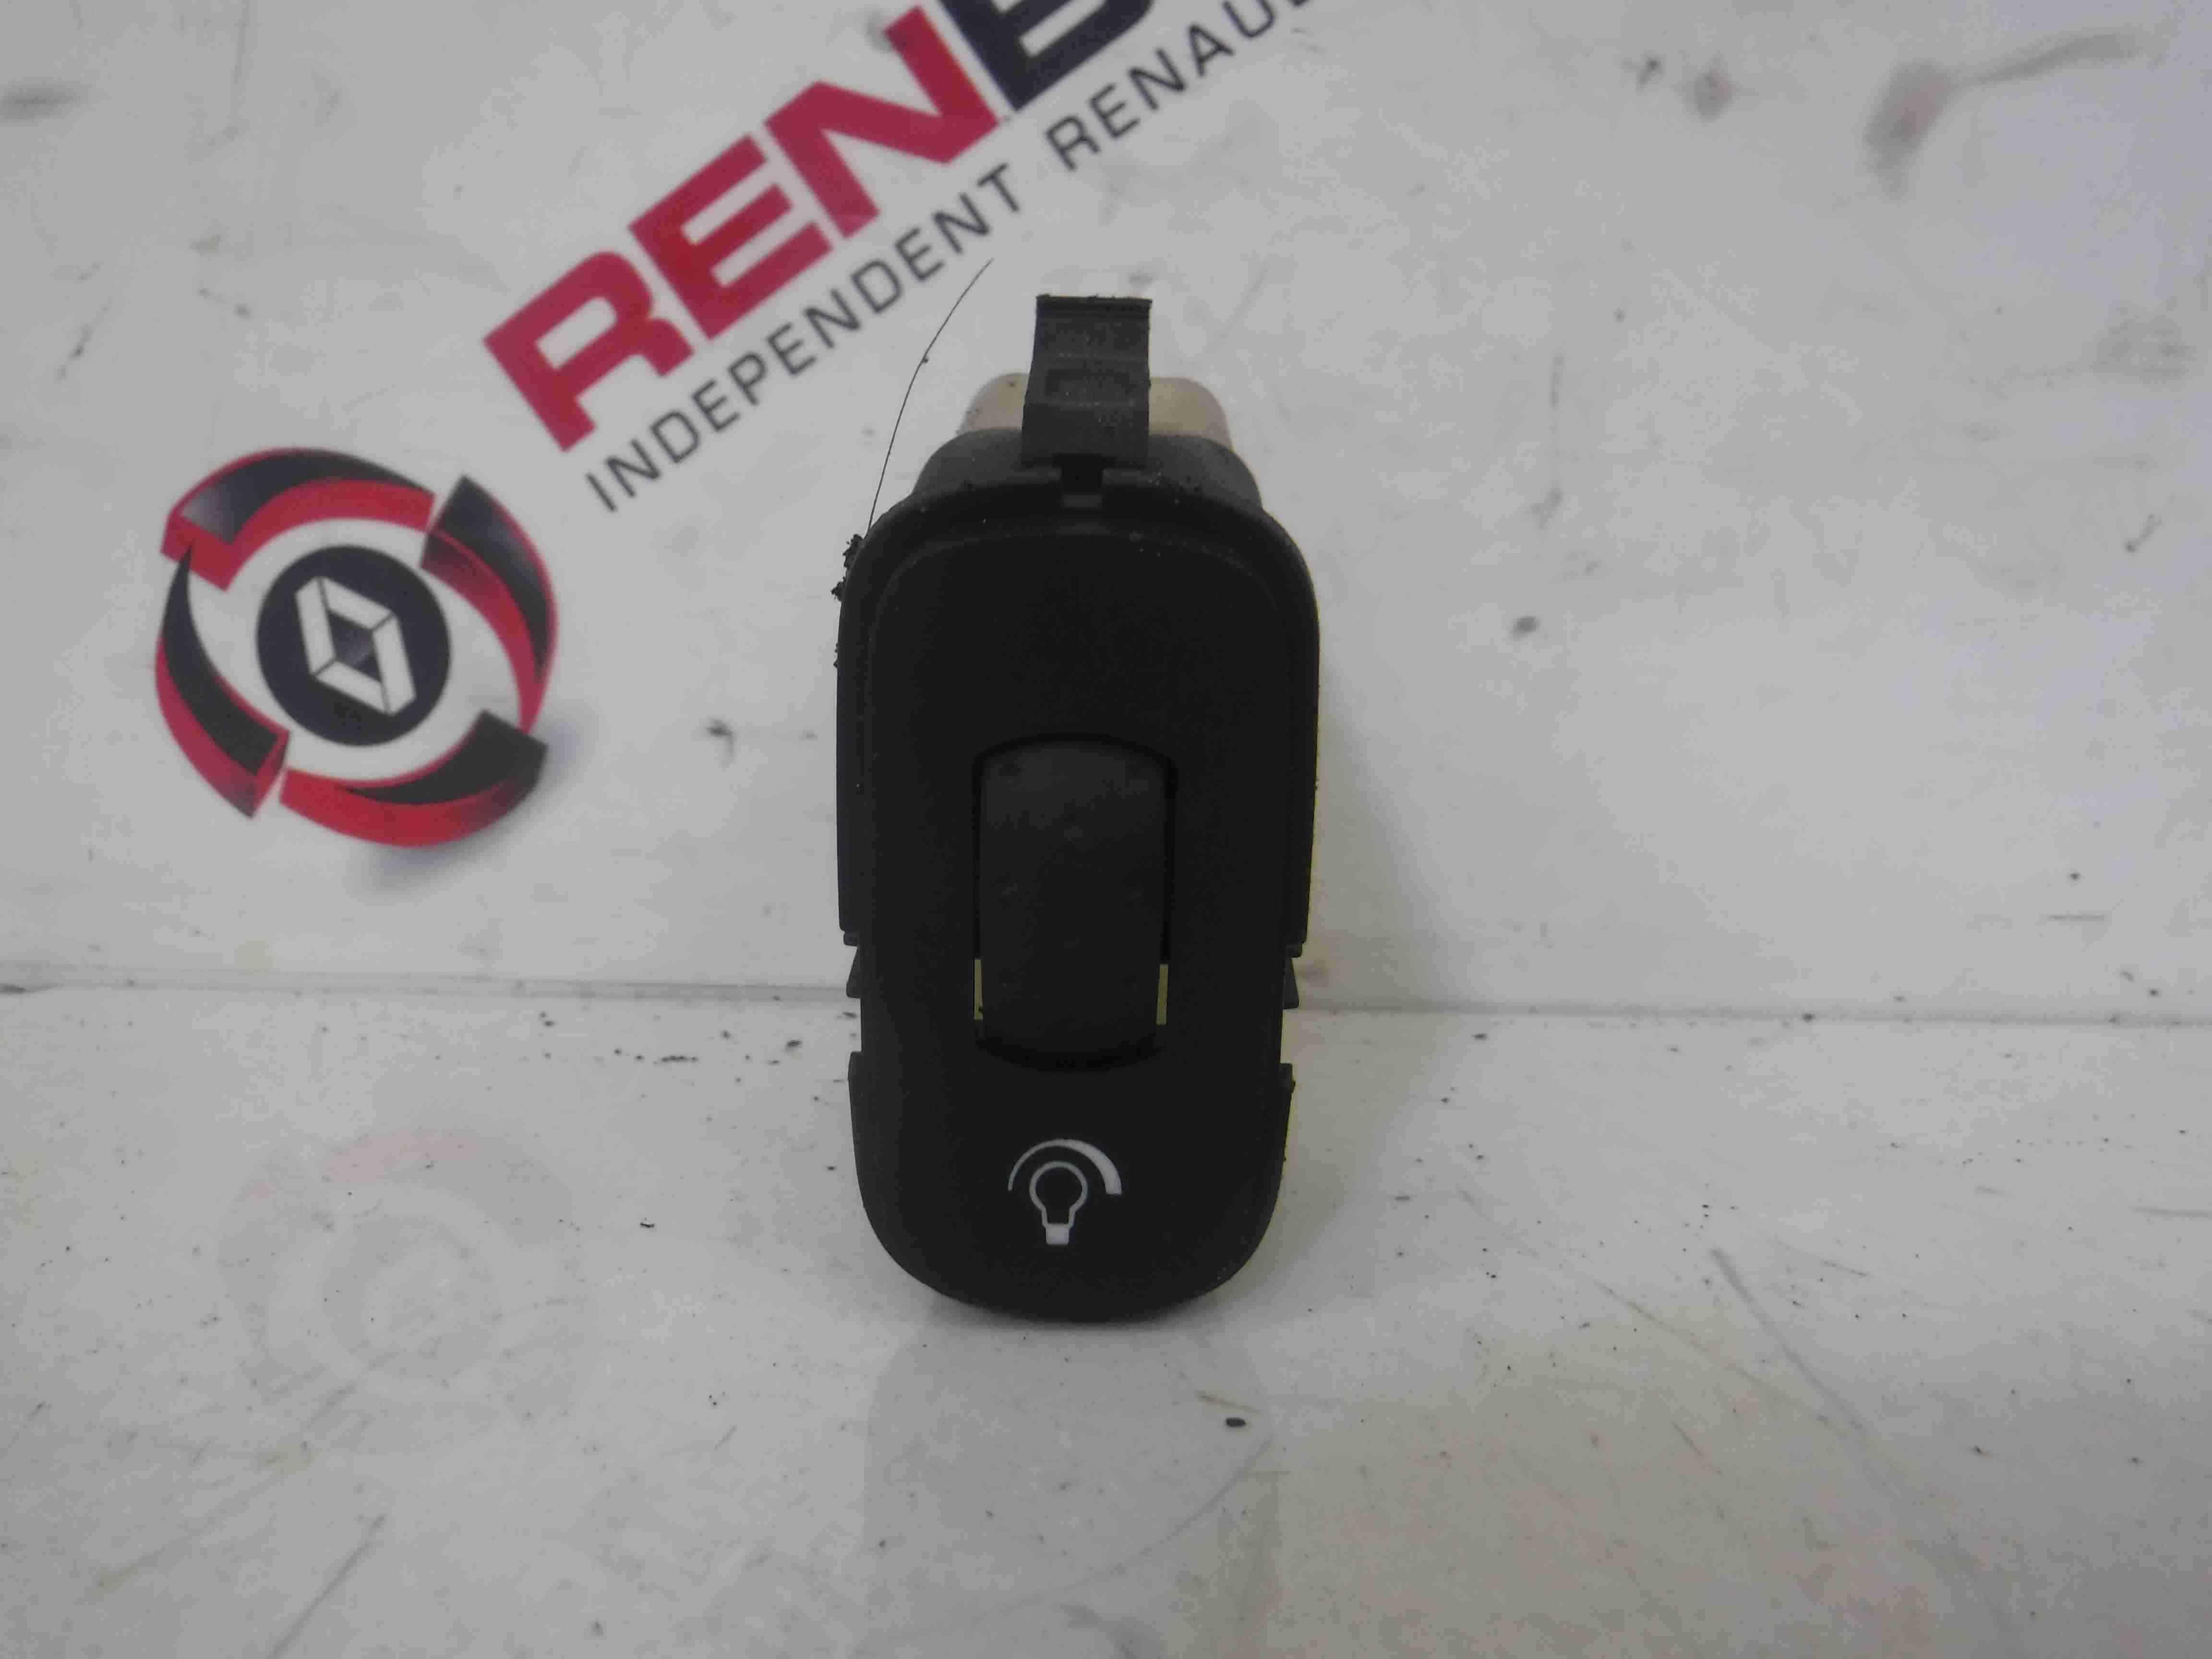 Renault Espace 2003-2013 Dashboard Light Dimmer Switch Adjuster